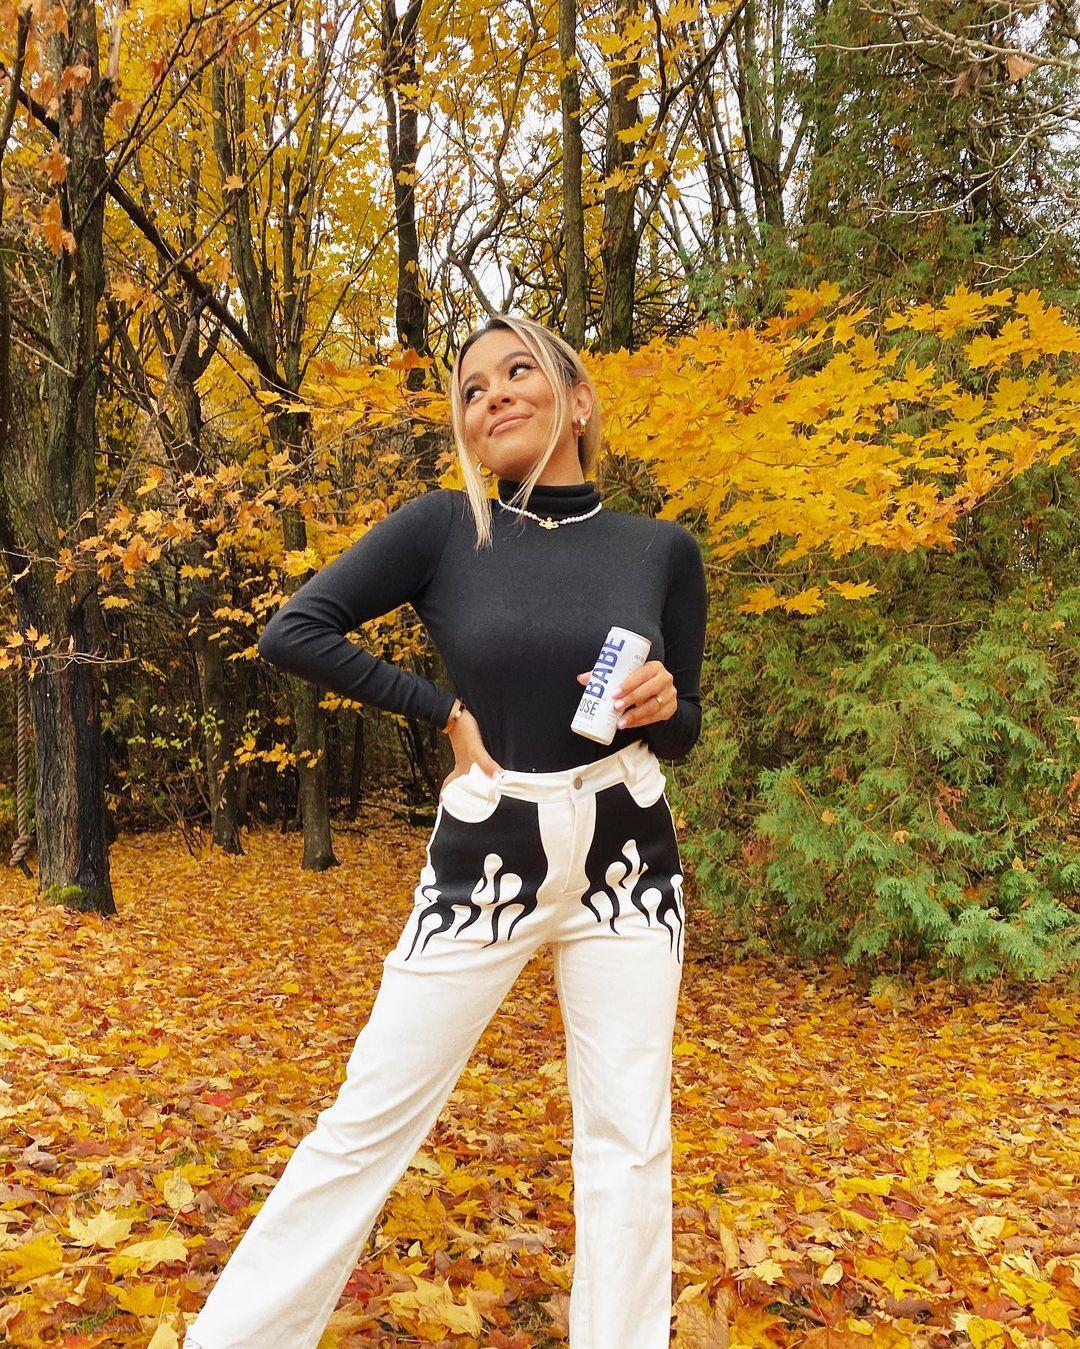 Adelaine-Morin-Wallpapers-Insta-Fit-Bio-1